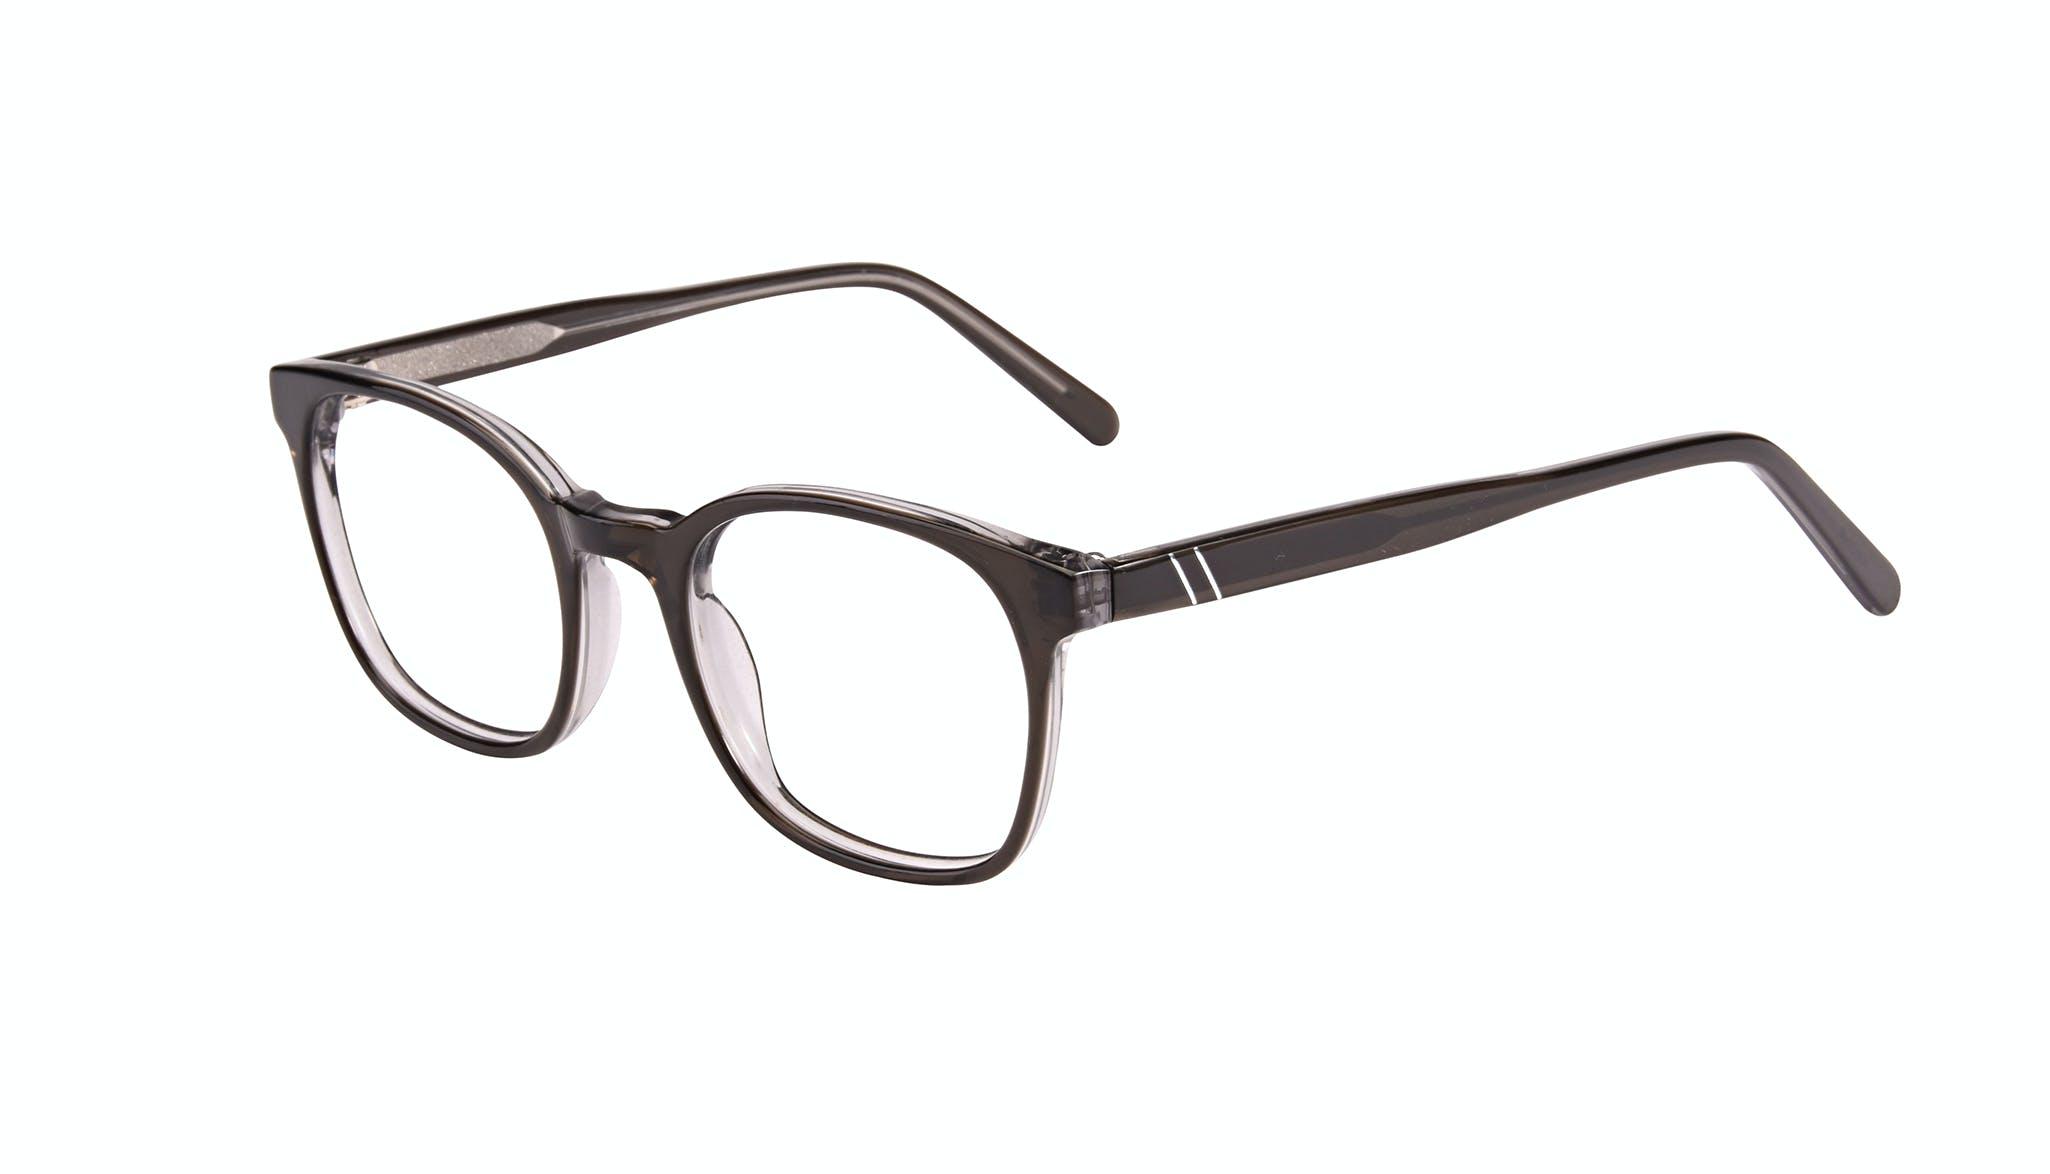 Affordable Fashion Glasses Rectangle Eyeglasses Men Trace Black Ice Tilt